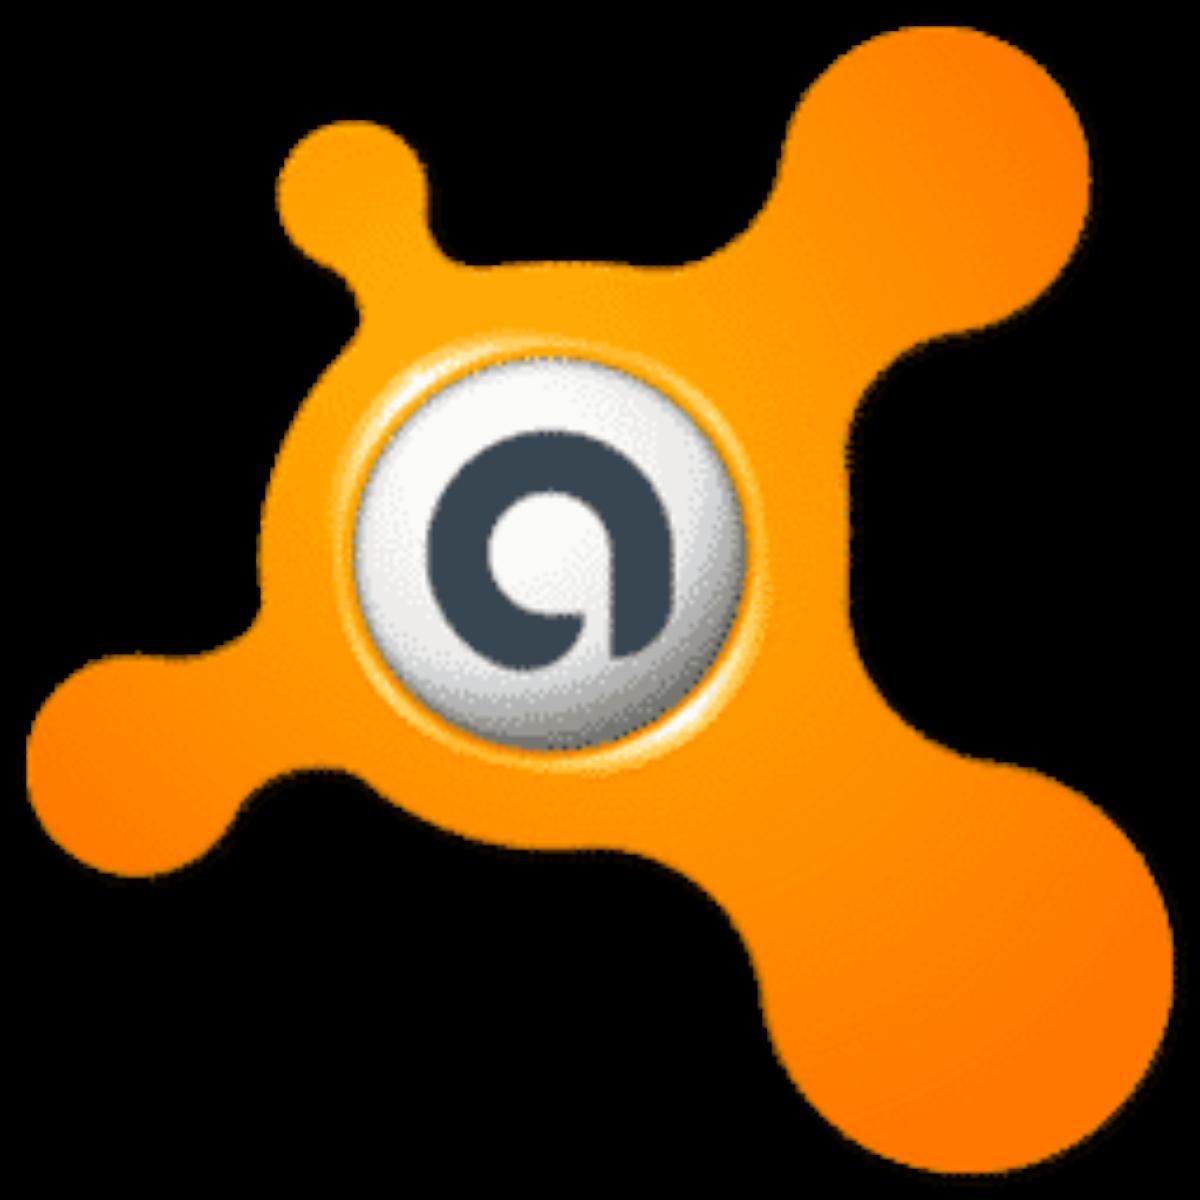 Avast Antivirus 21 1 2449 Download For Windows 7 10 8 32 64 Bit